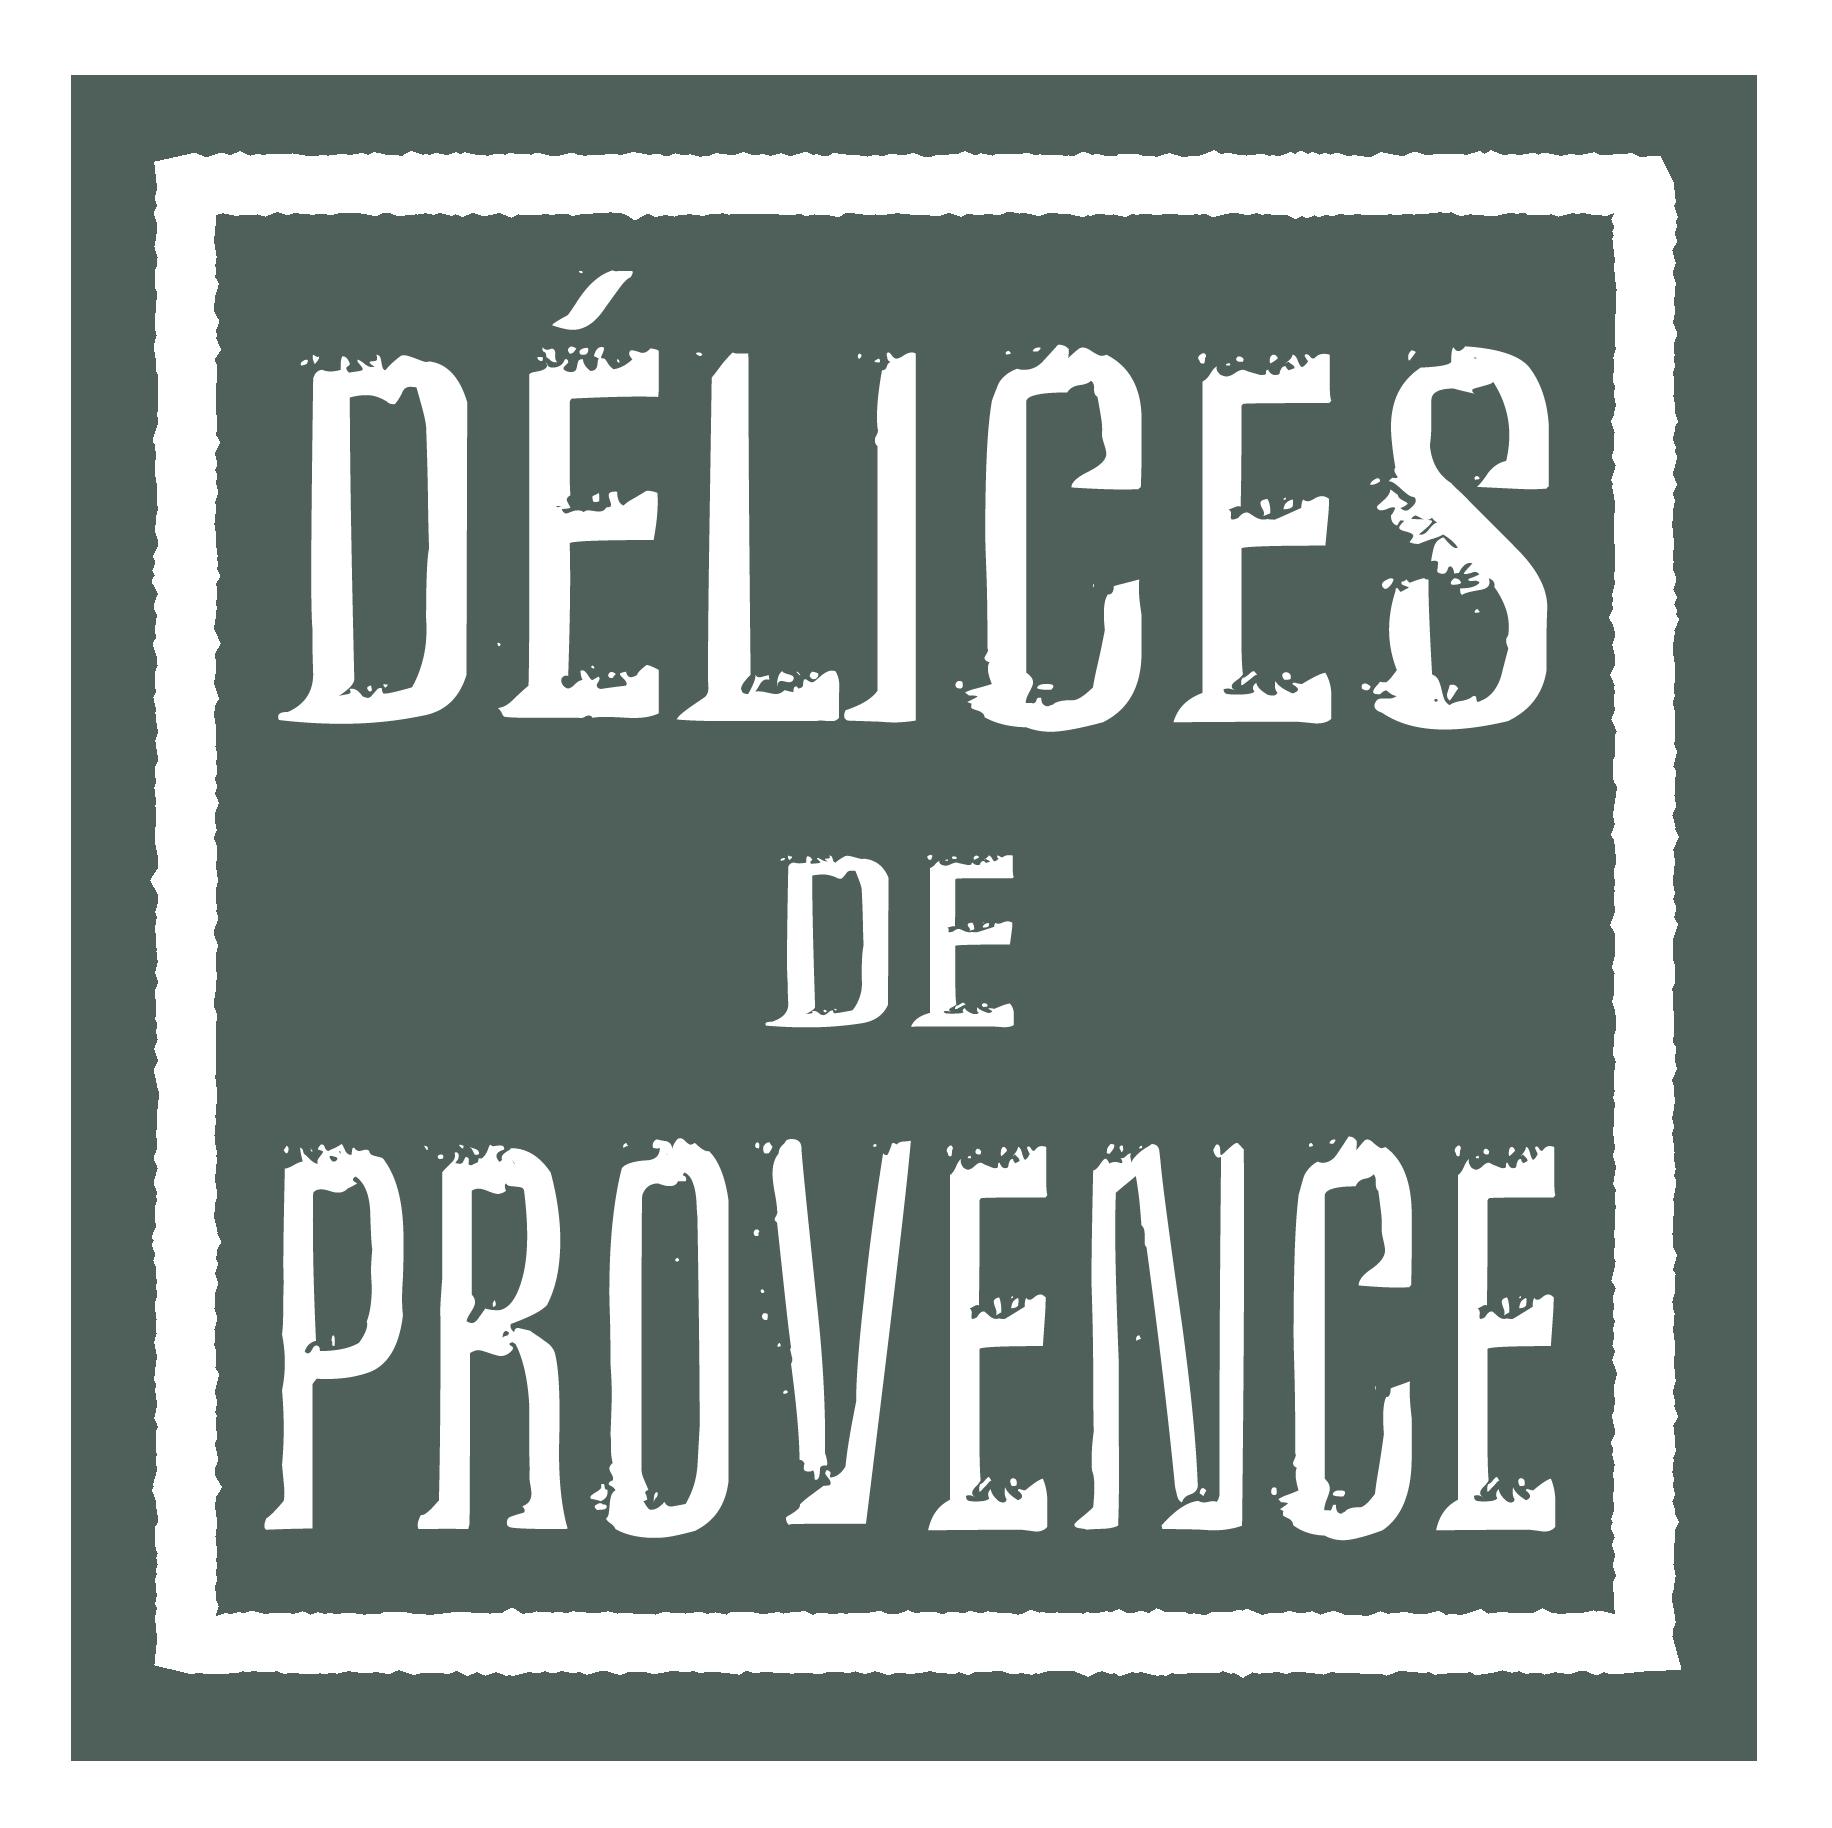 Delices de Provence